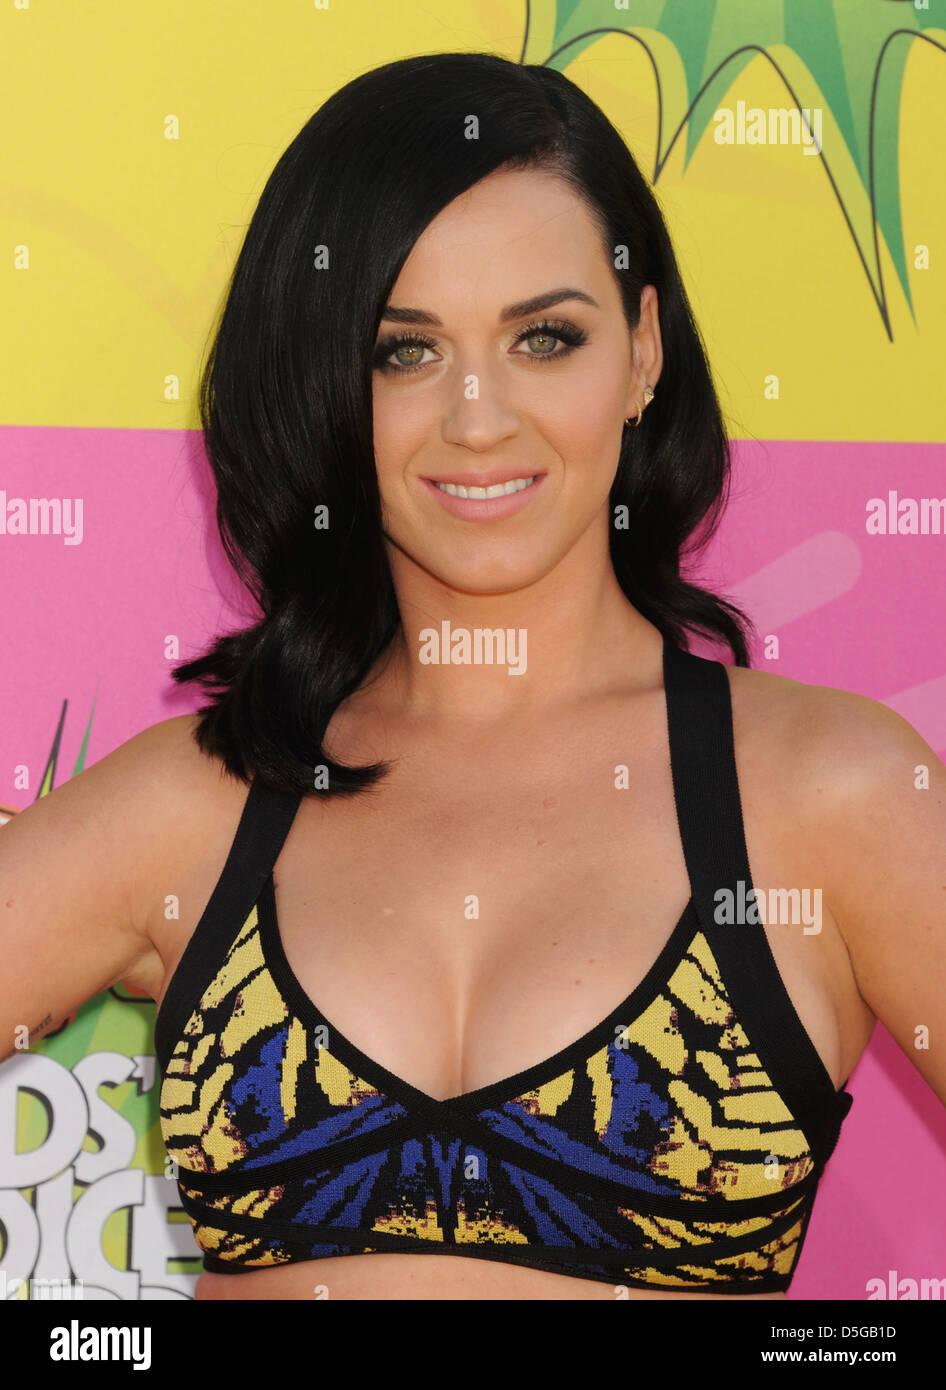 Katy Perry Fotos & Katy Perry Imagens de Stock - Alamy